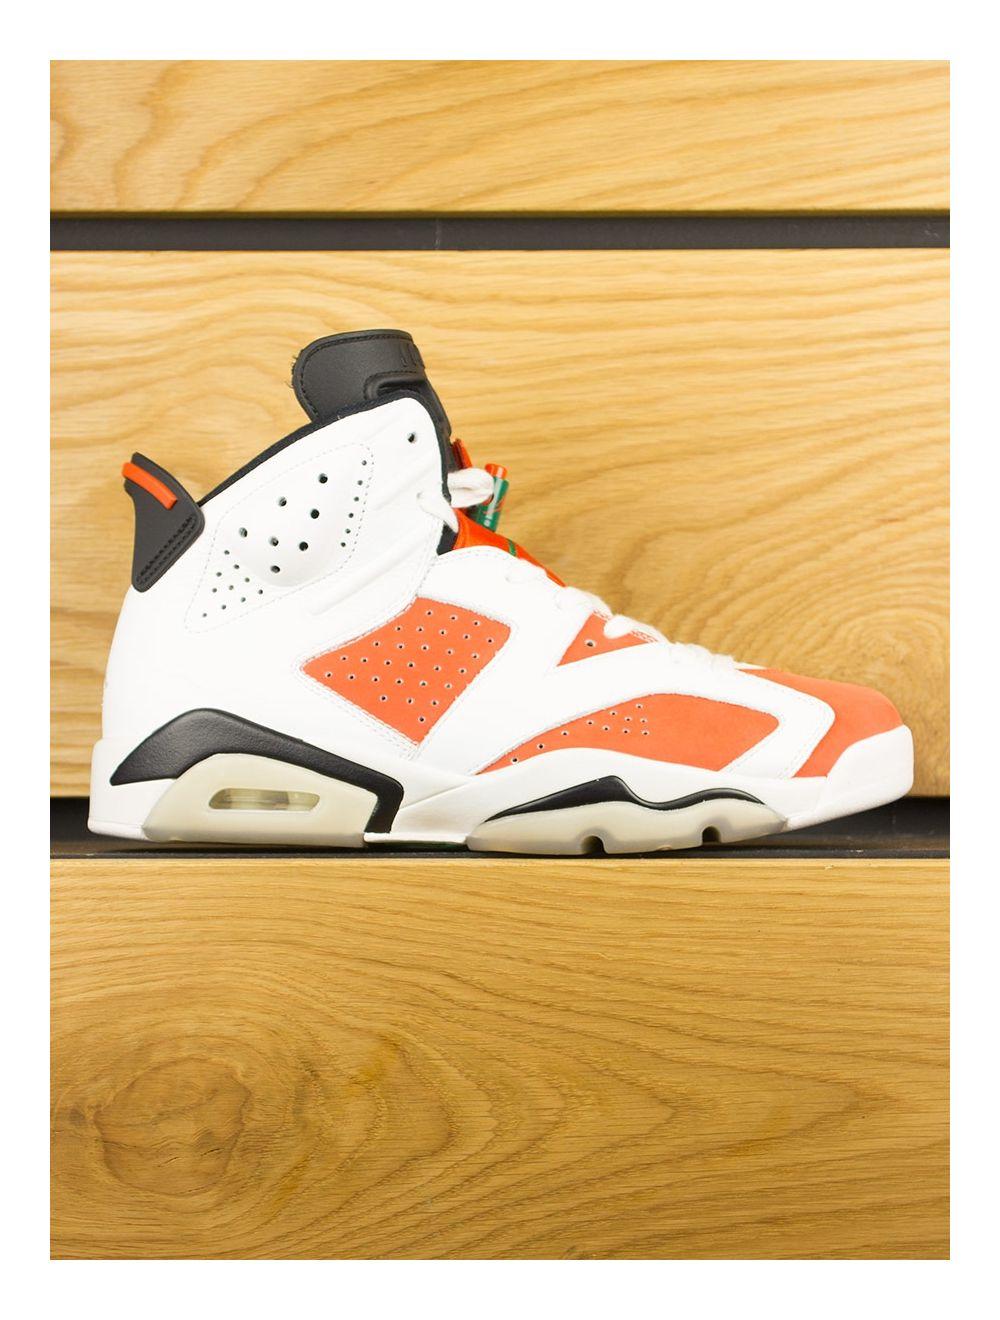 quality design d6b0a 187a1 Nike Air Jordan 6 Retro x Gatorade 'Like Mike' - Summit White Team Orange